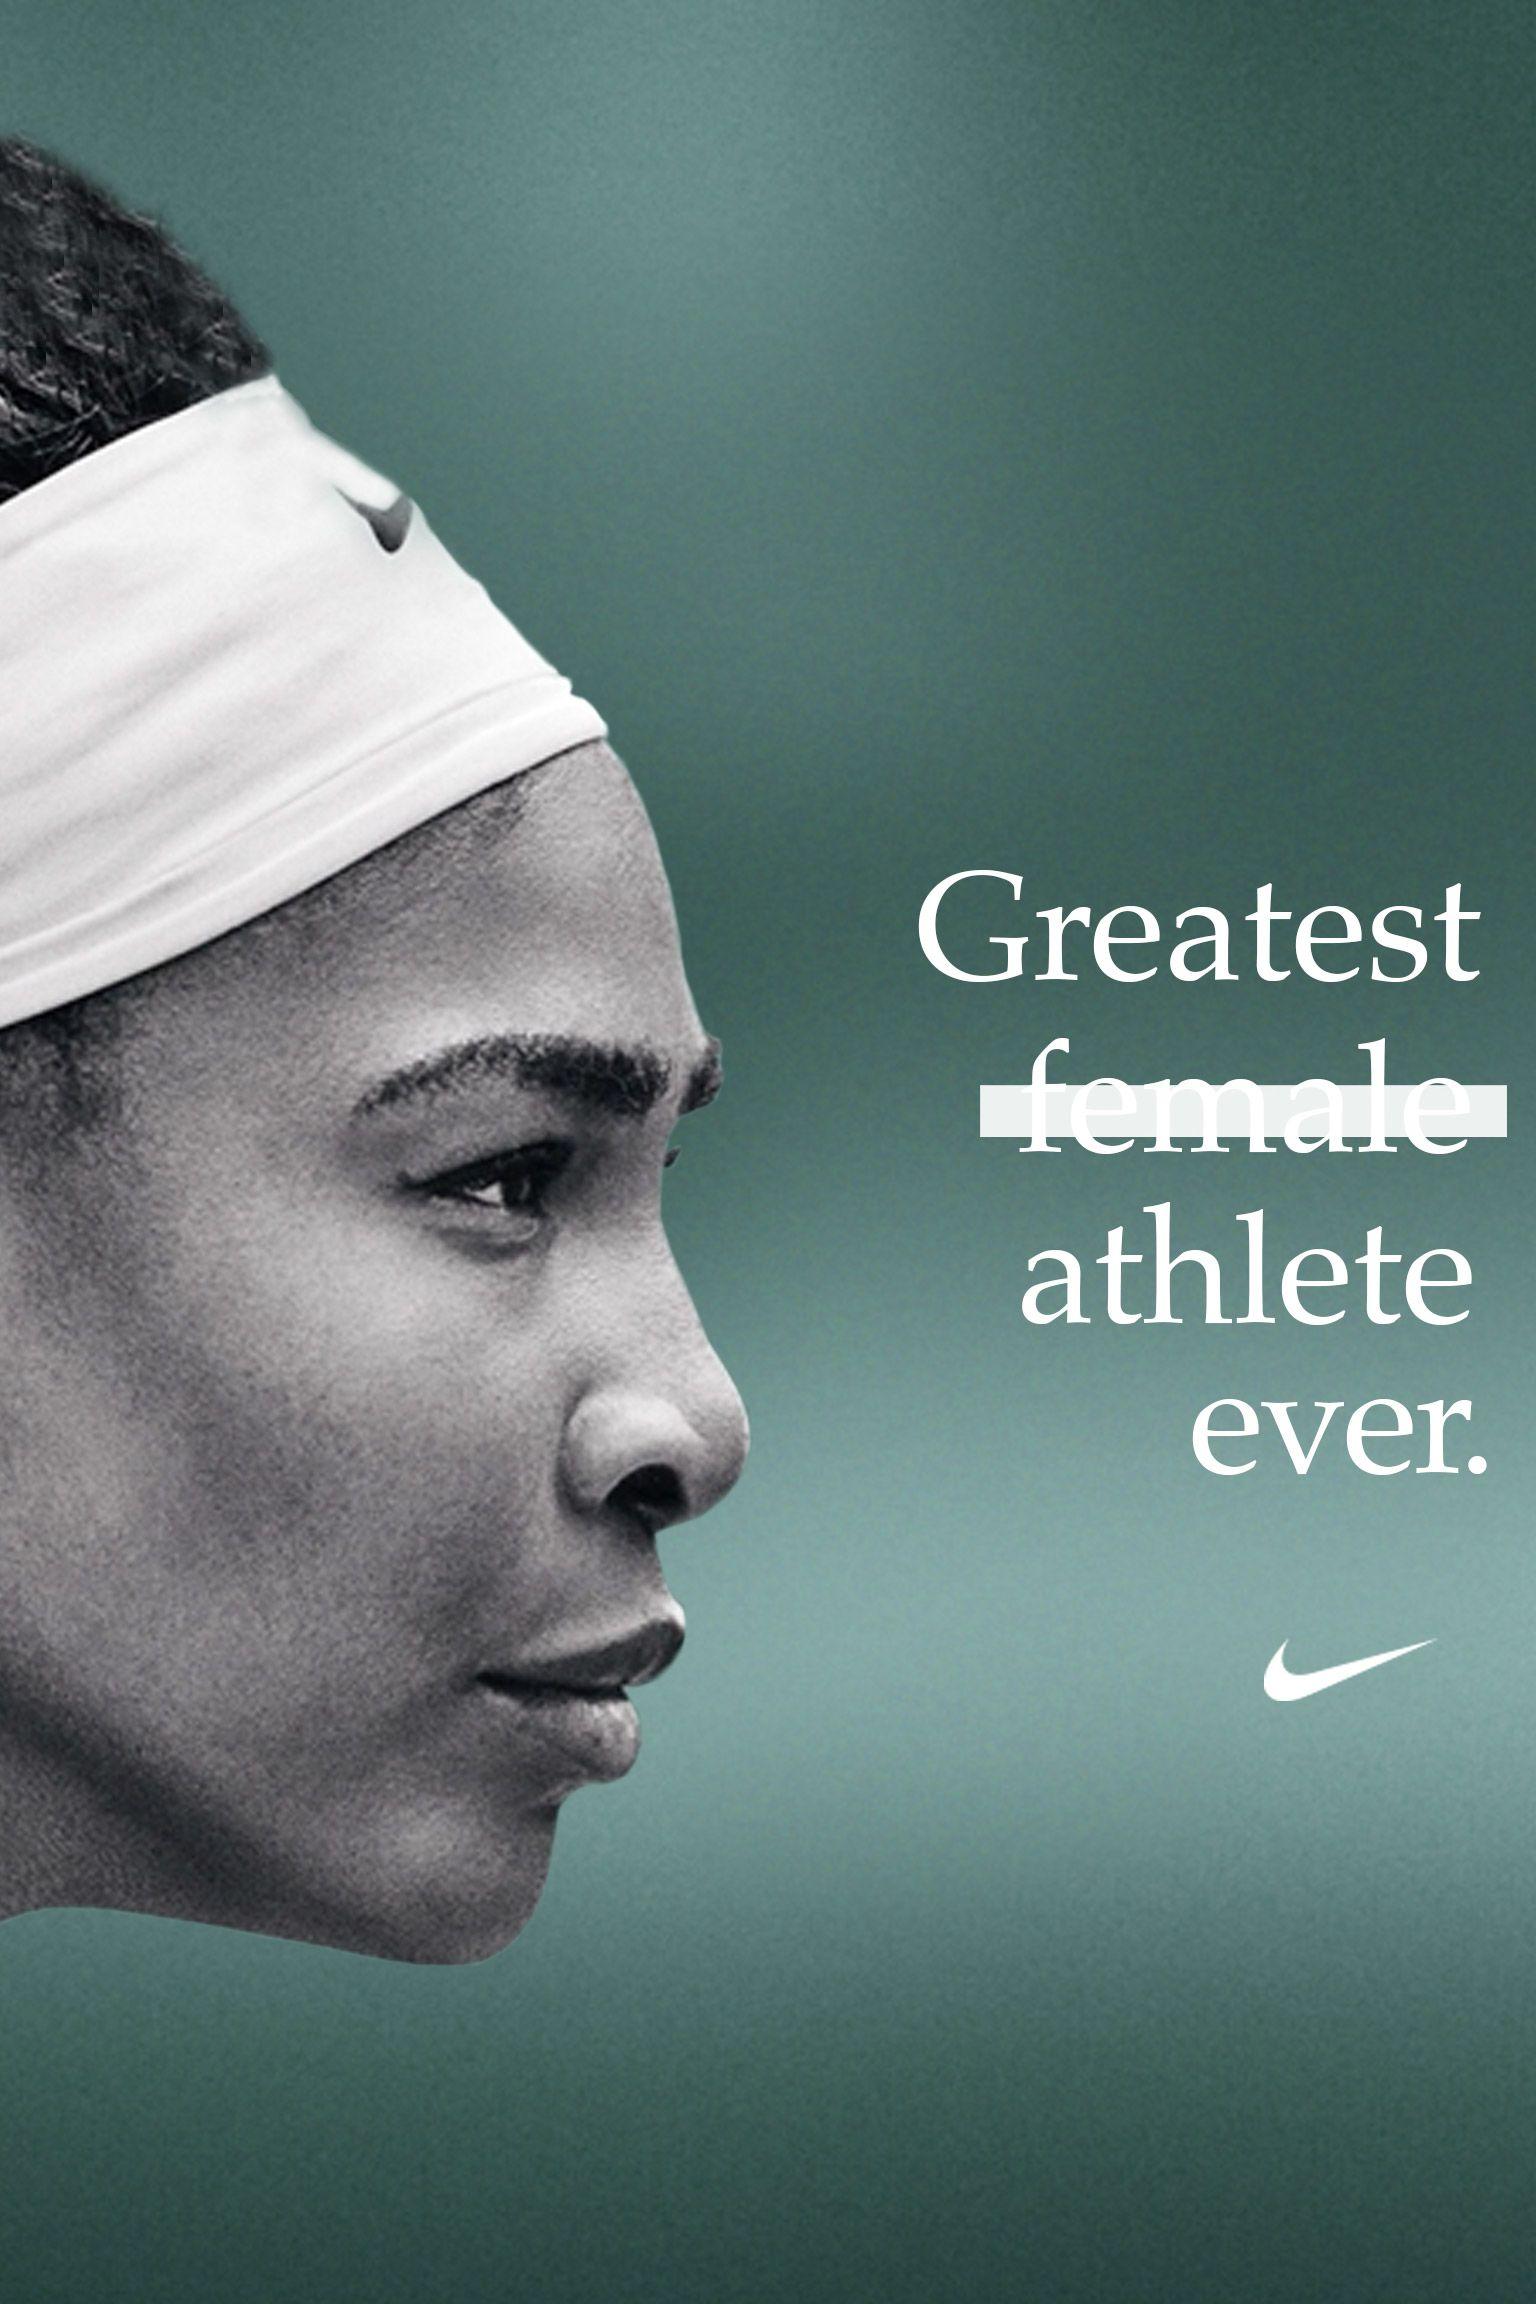 Serena Williams: Határtalan nagyság